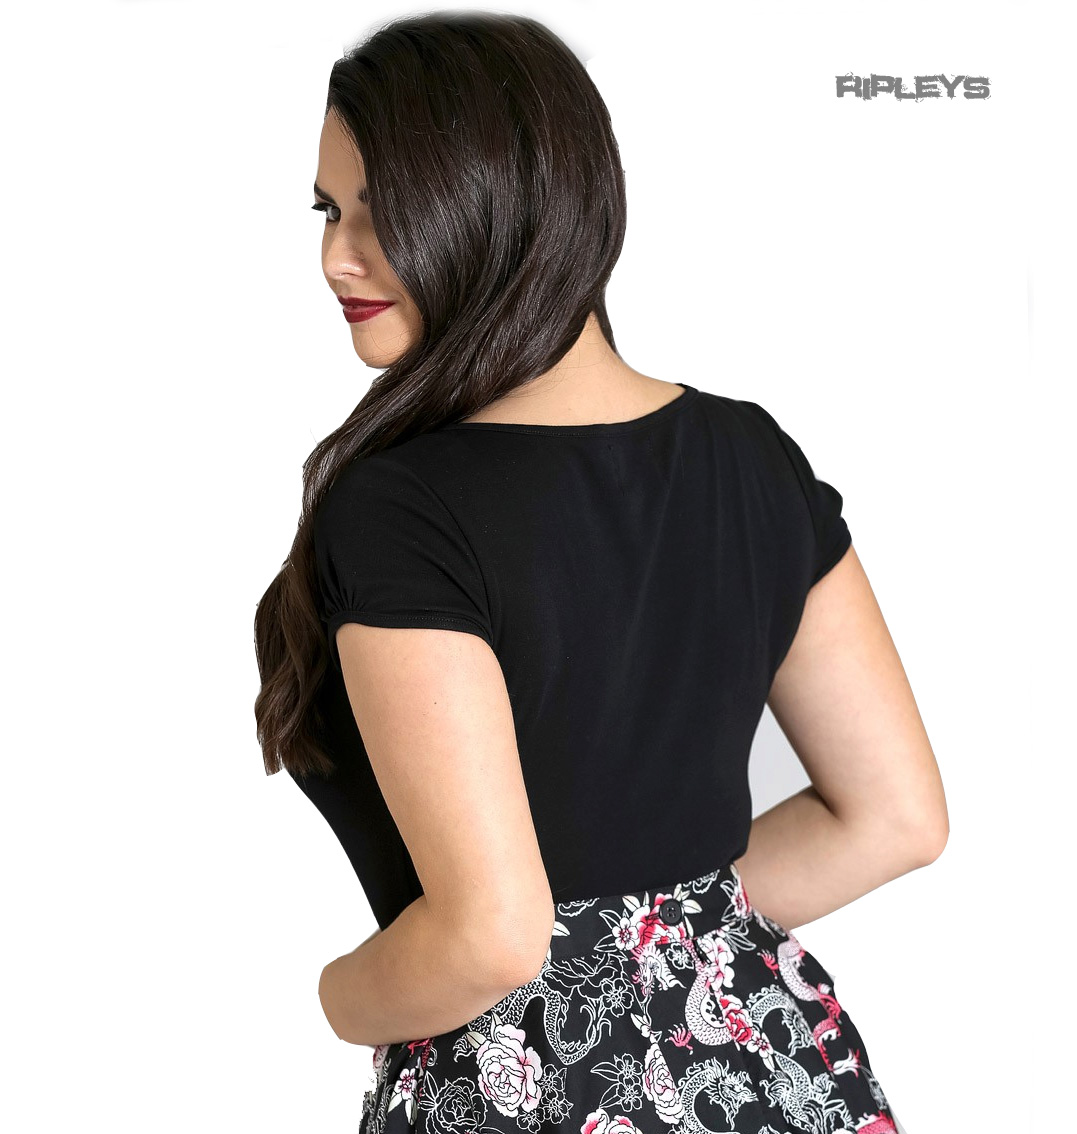 Hell-Bunny-Shirt-50s-Rockabilly-Top-MIA-Plain-Black-Short-Sleeves-All-Sizes thumbnail 46